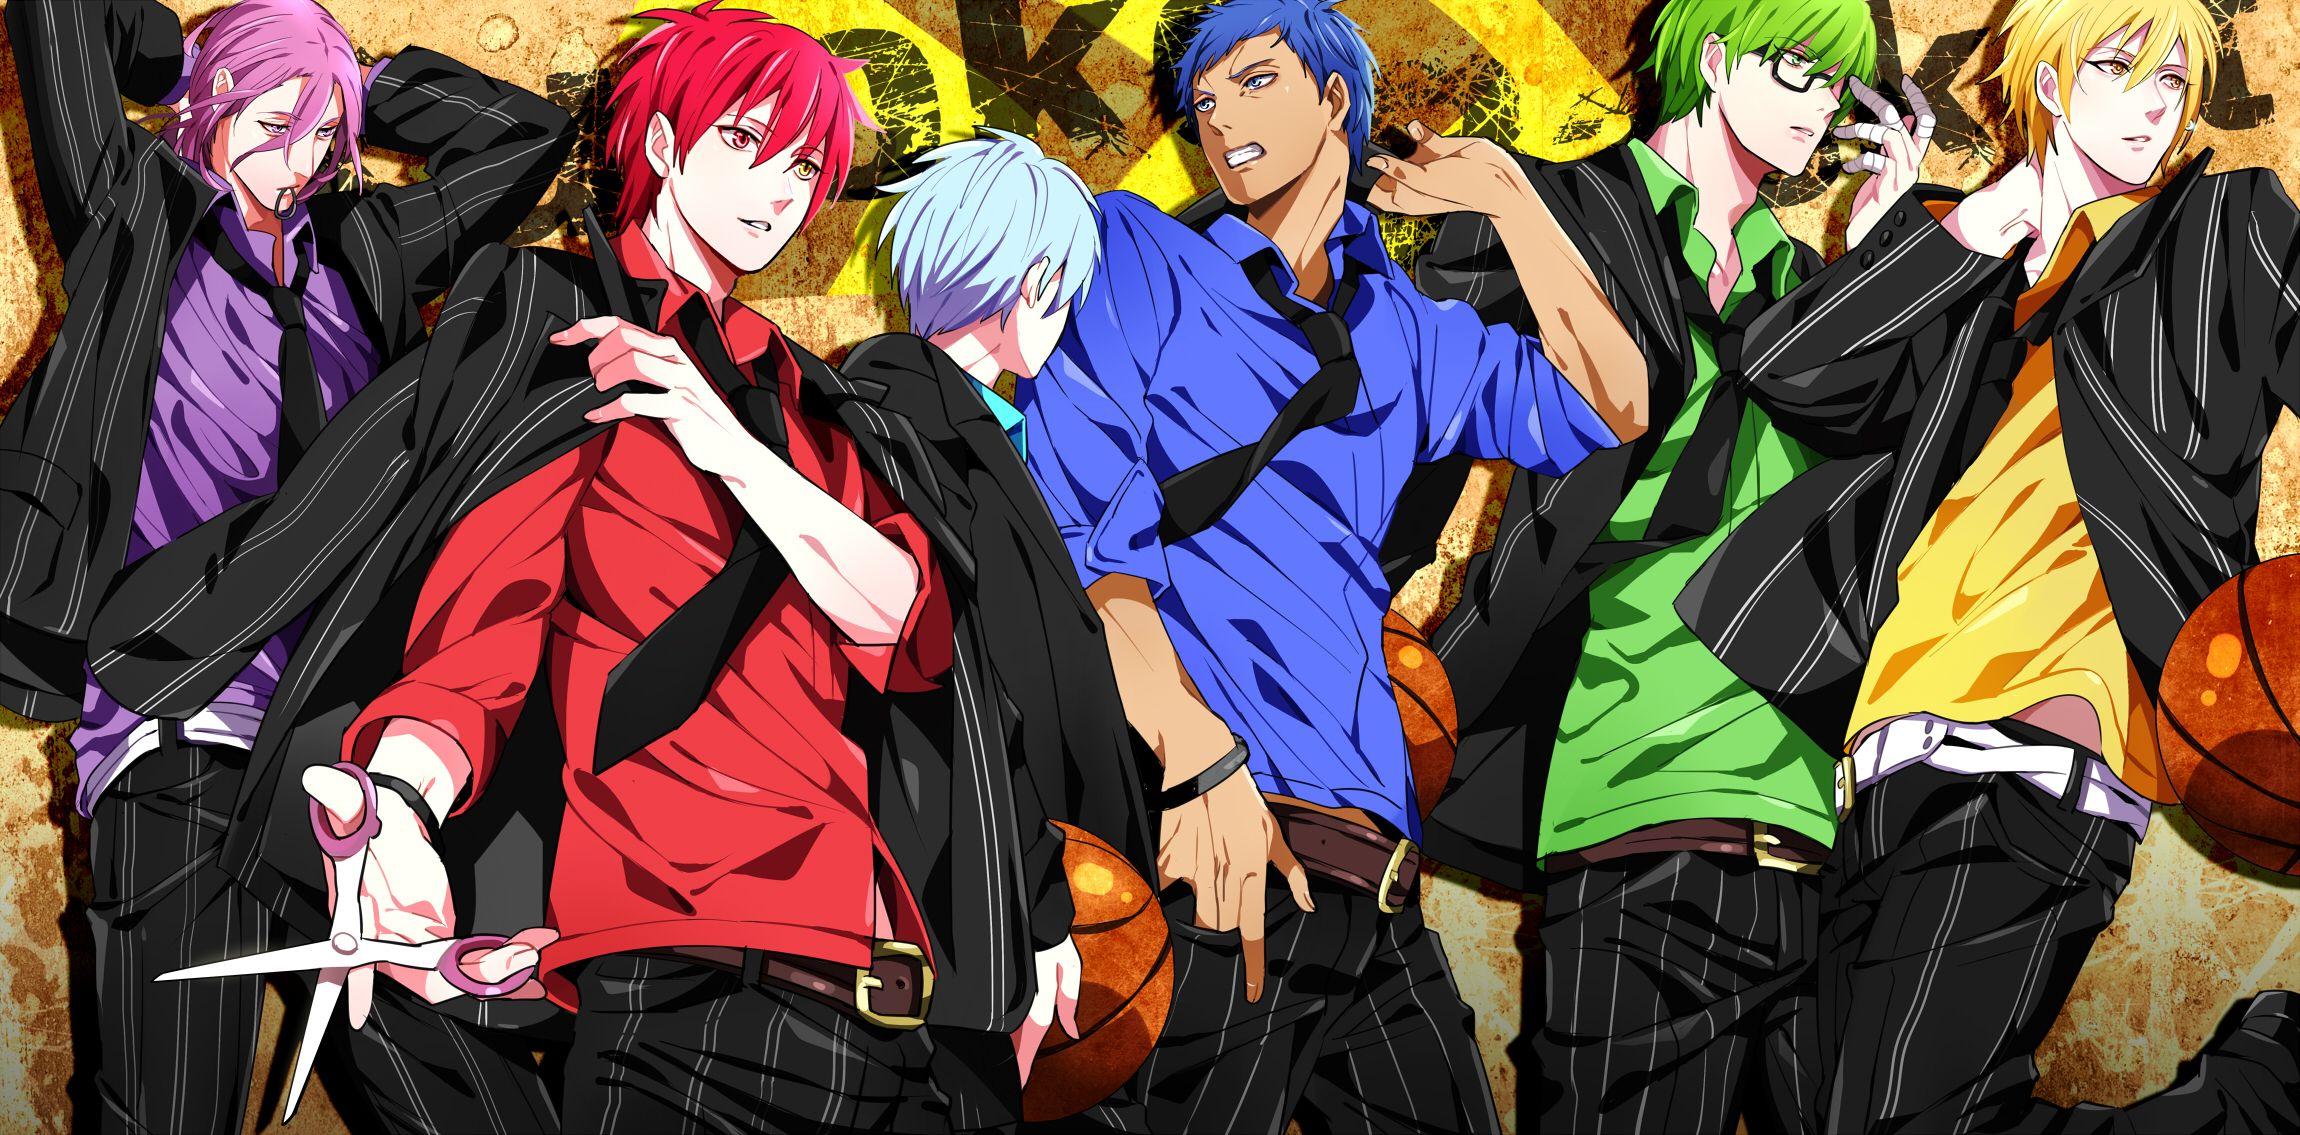 Generation of Miracles Kuroko no basket, Kuroko et